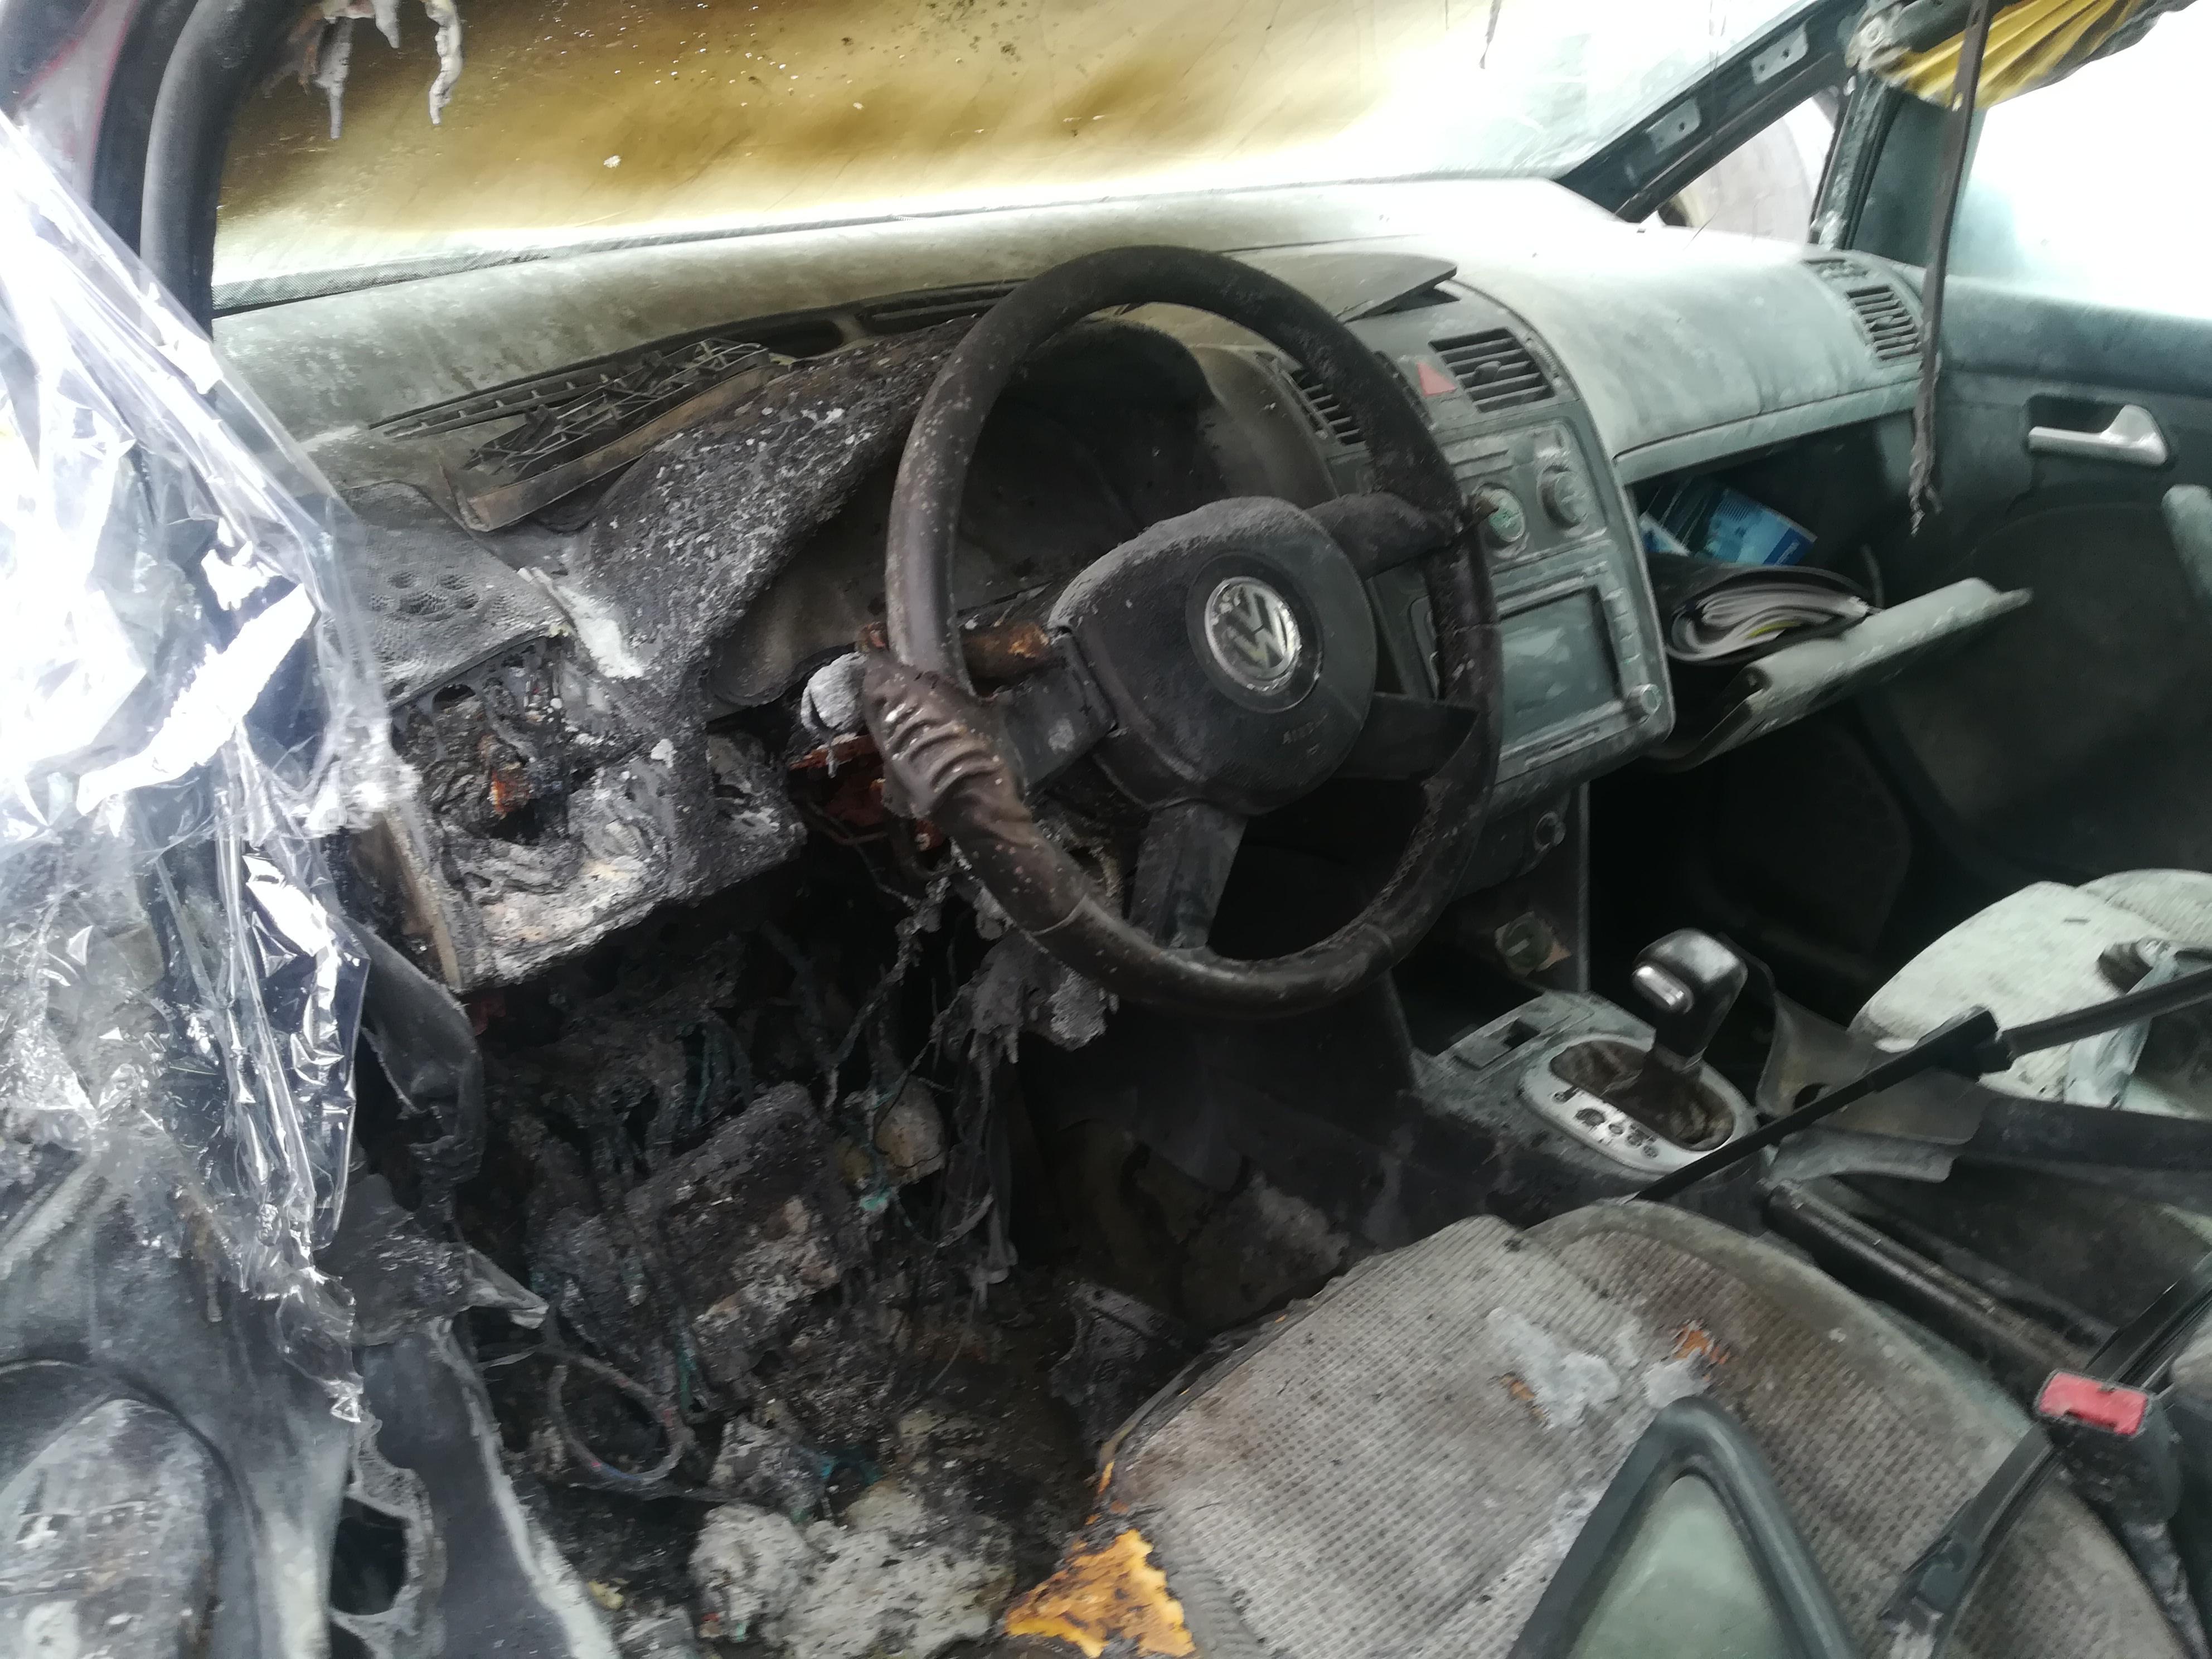 Used Car Parts Foto 6 Volkswagen TOURAN 2004 2.0 Automatic Minivan 4/5 d. Black 2019-4-11 A4417